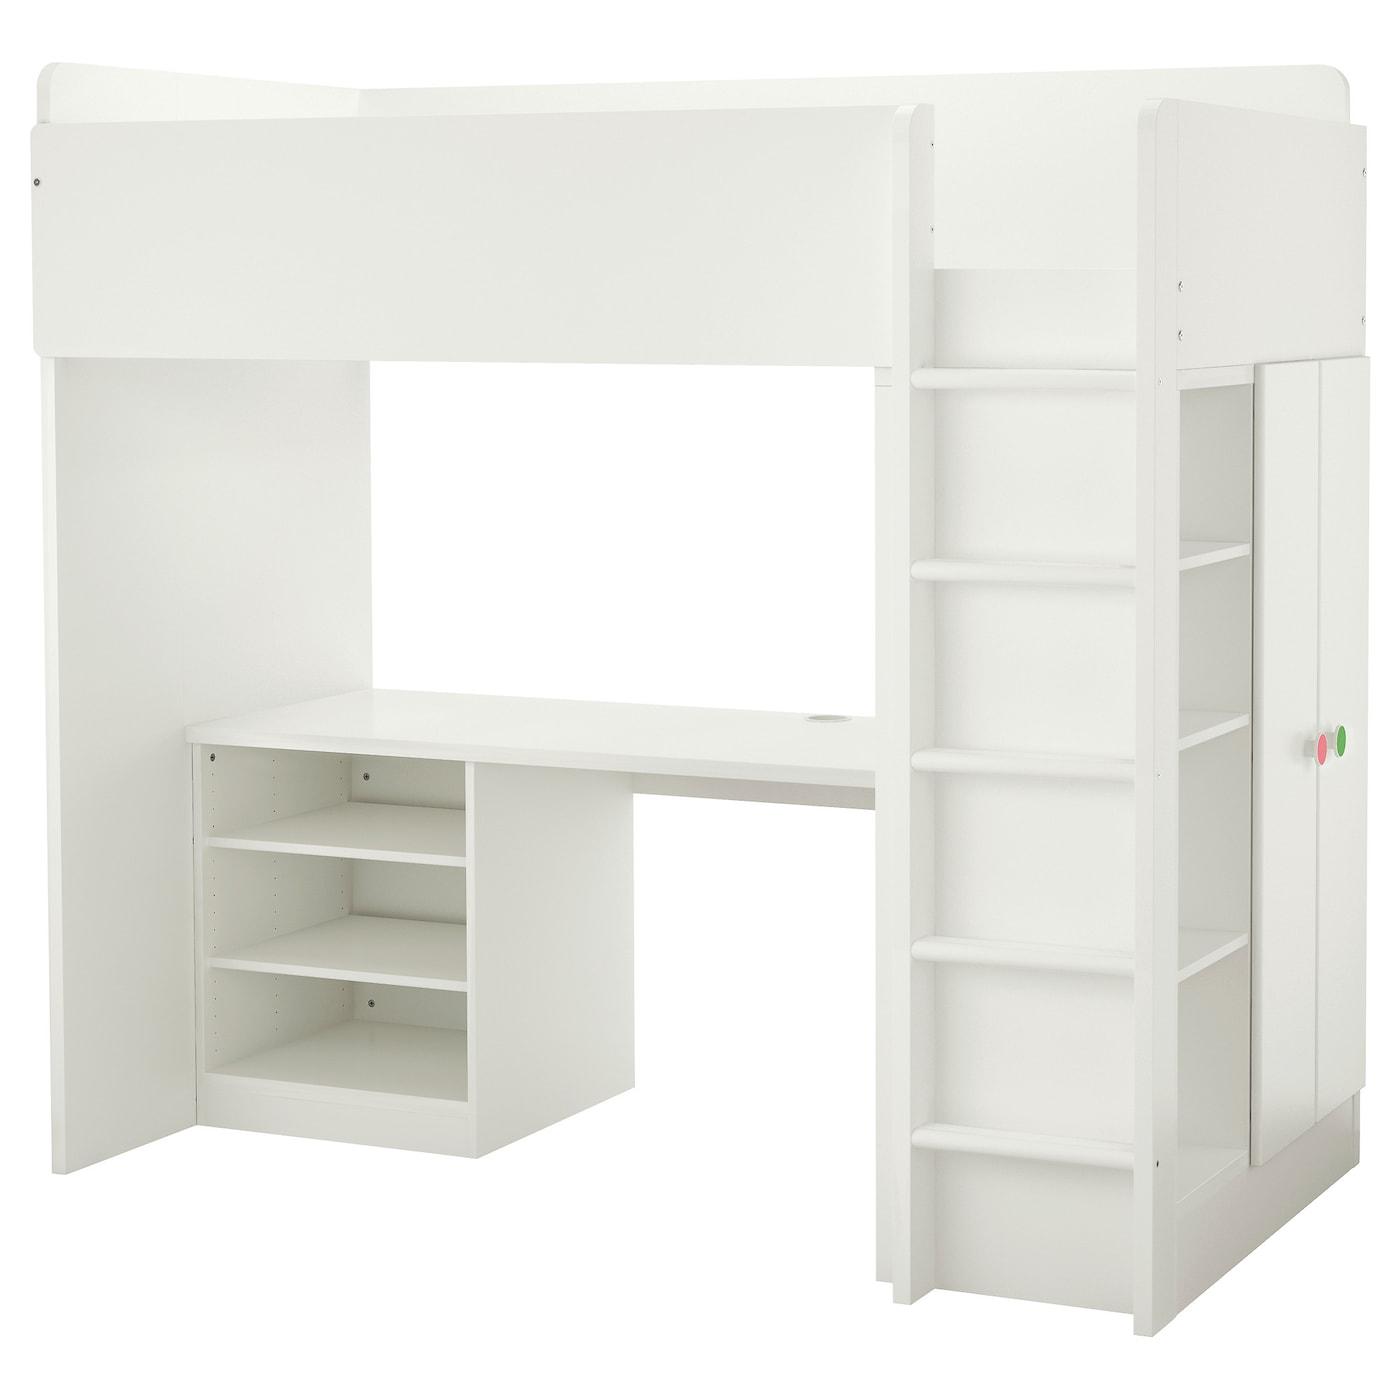 Ikea loft bed with desk - Ikea Stuva F Lja Loft Bed Combo W 2 Shelves 2 Doors